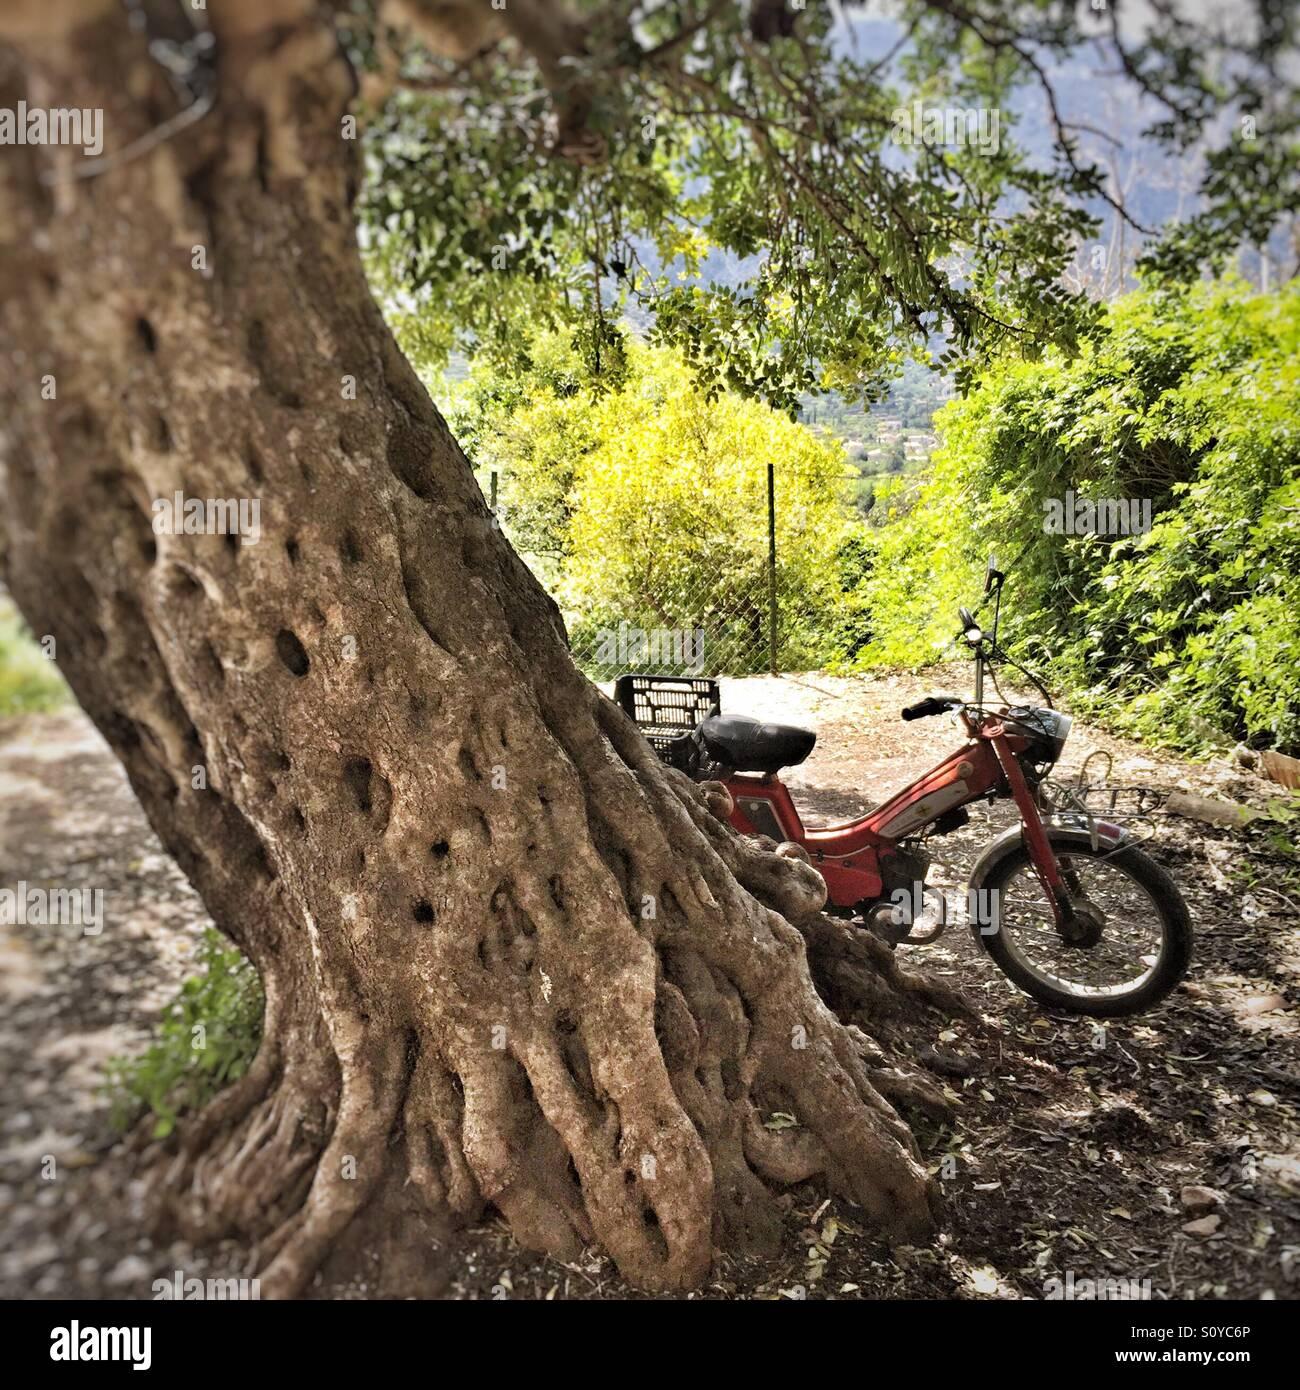 Old motorbike under Carob Tree in Mallorca Stock Photo